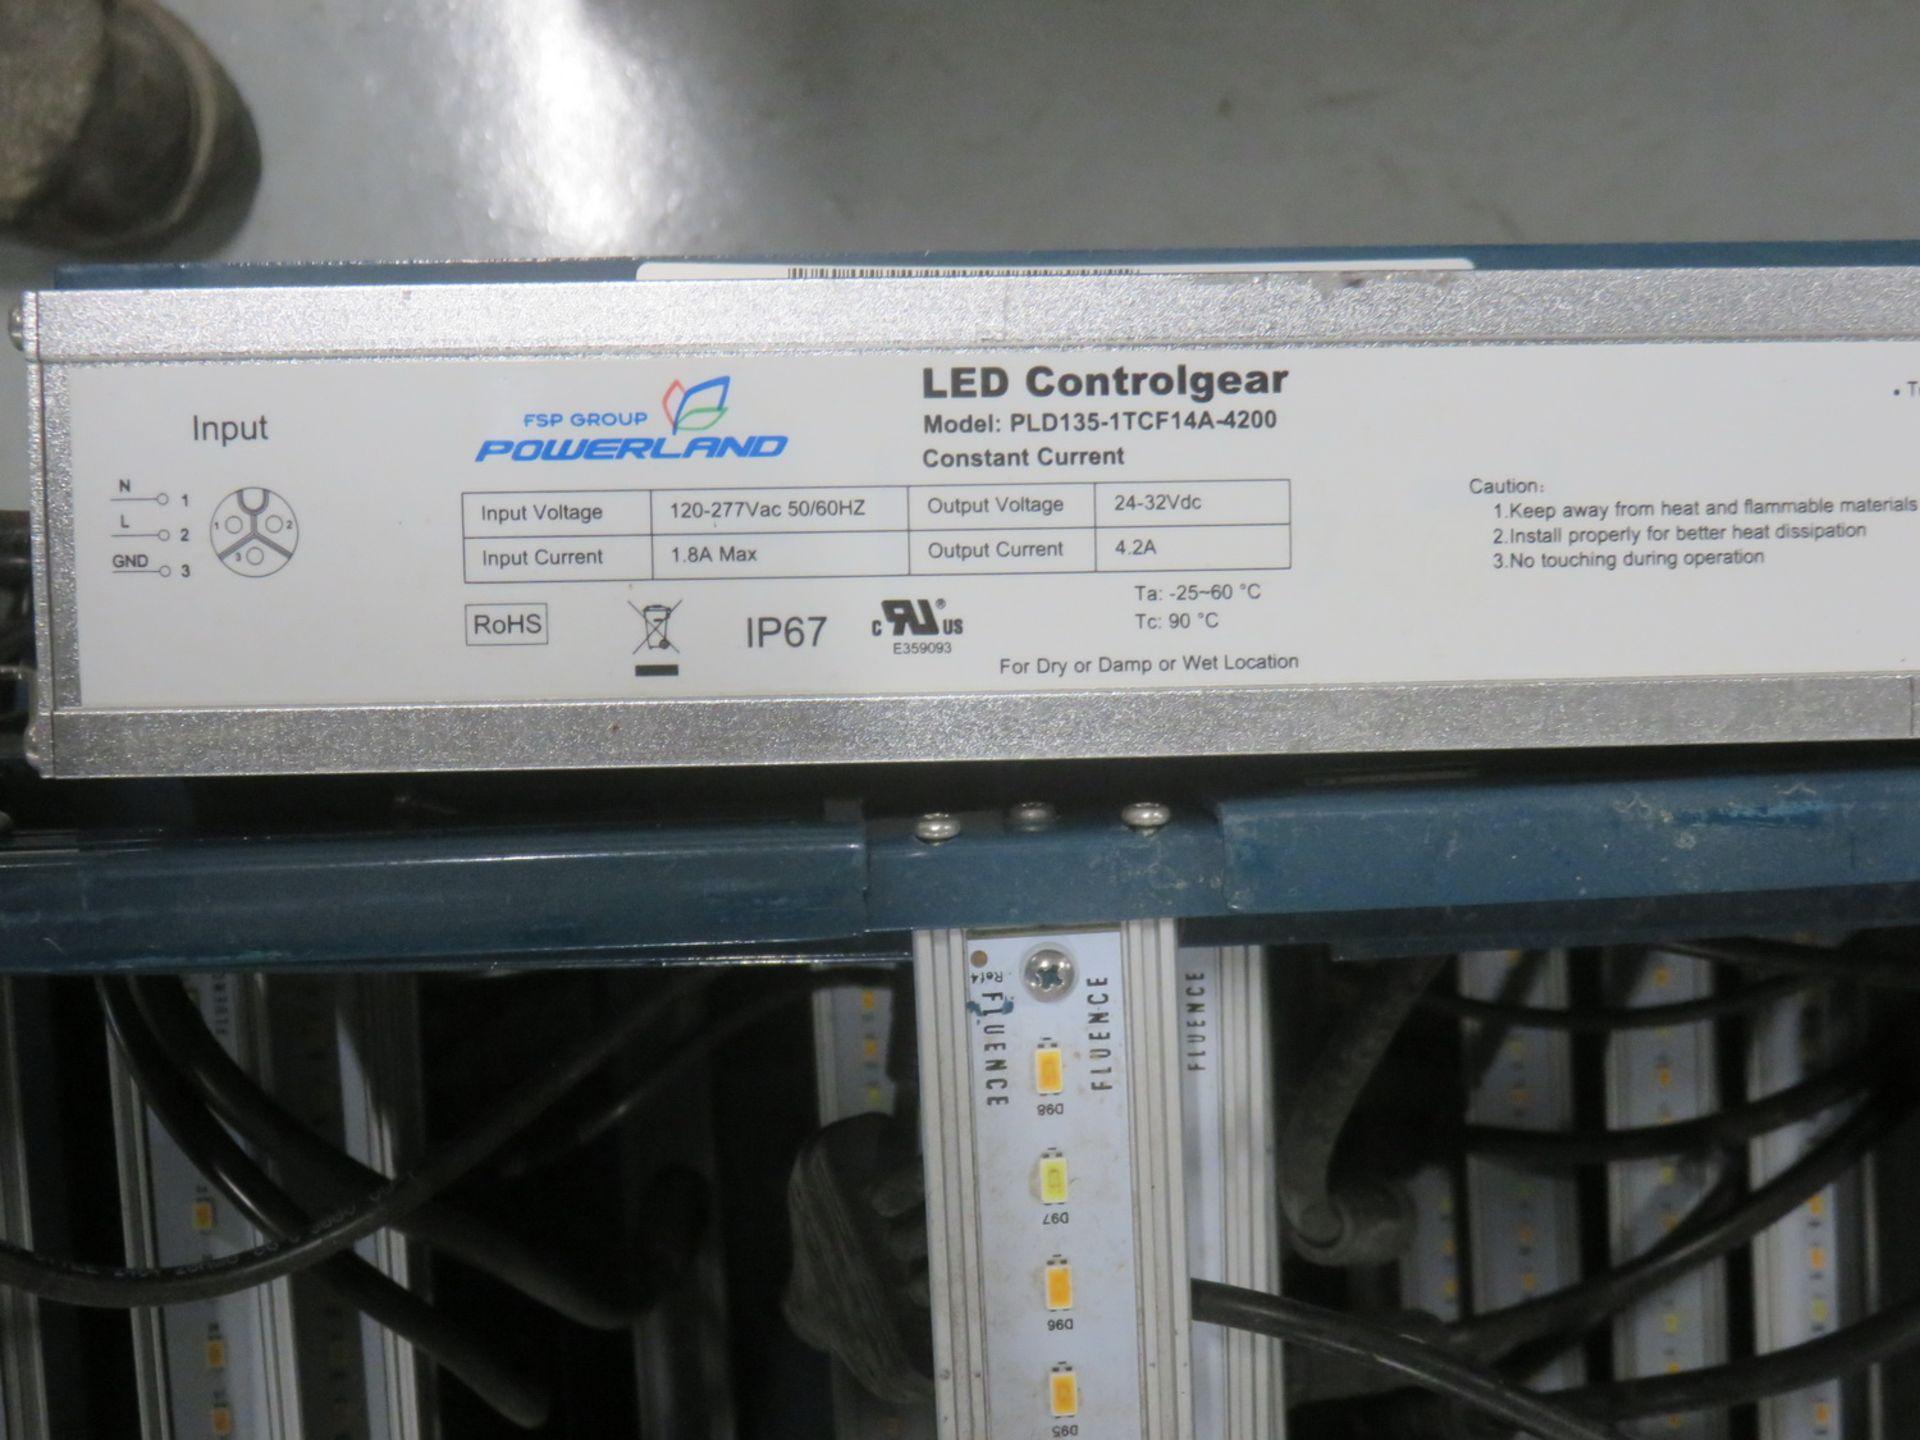 Lot 25 - UNITS - FLUENCE BIOENGINEERING RR1P1 4' LED LIGHT BARS W/ POWERLAND LED CONTROL GEAR PLD135 POWER